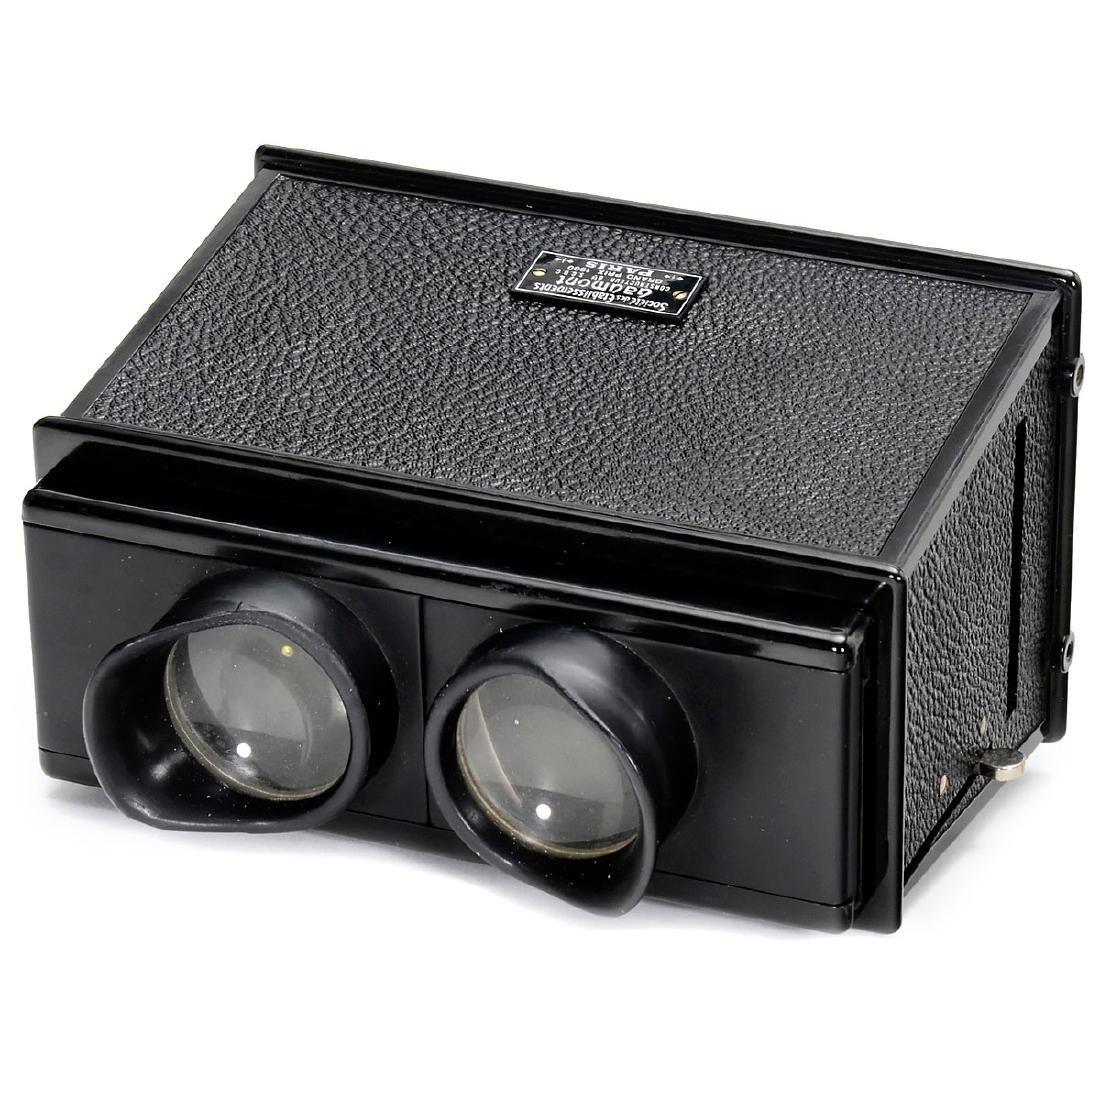 Gaumont Stereo Viewer 6 x 13, c. 1920